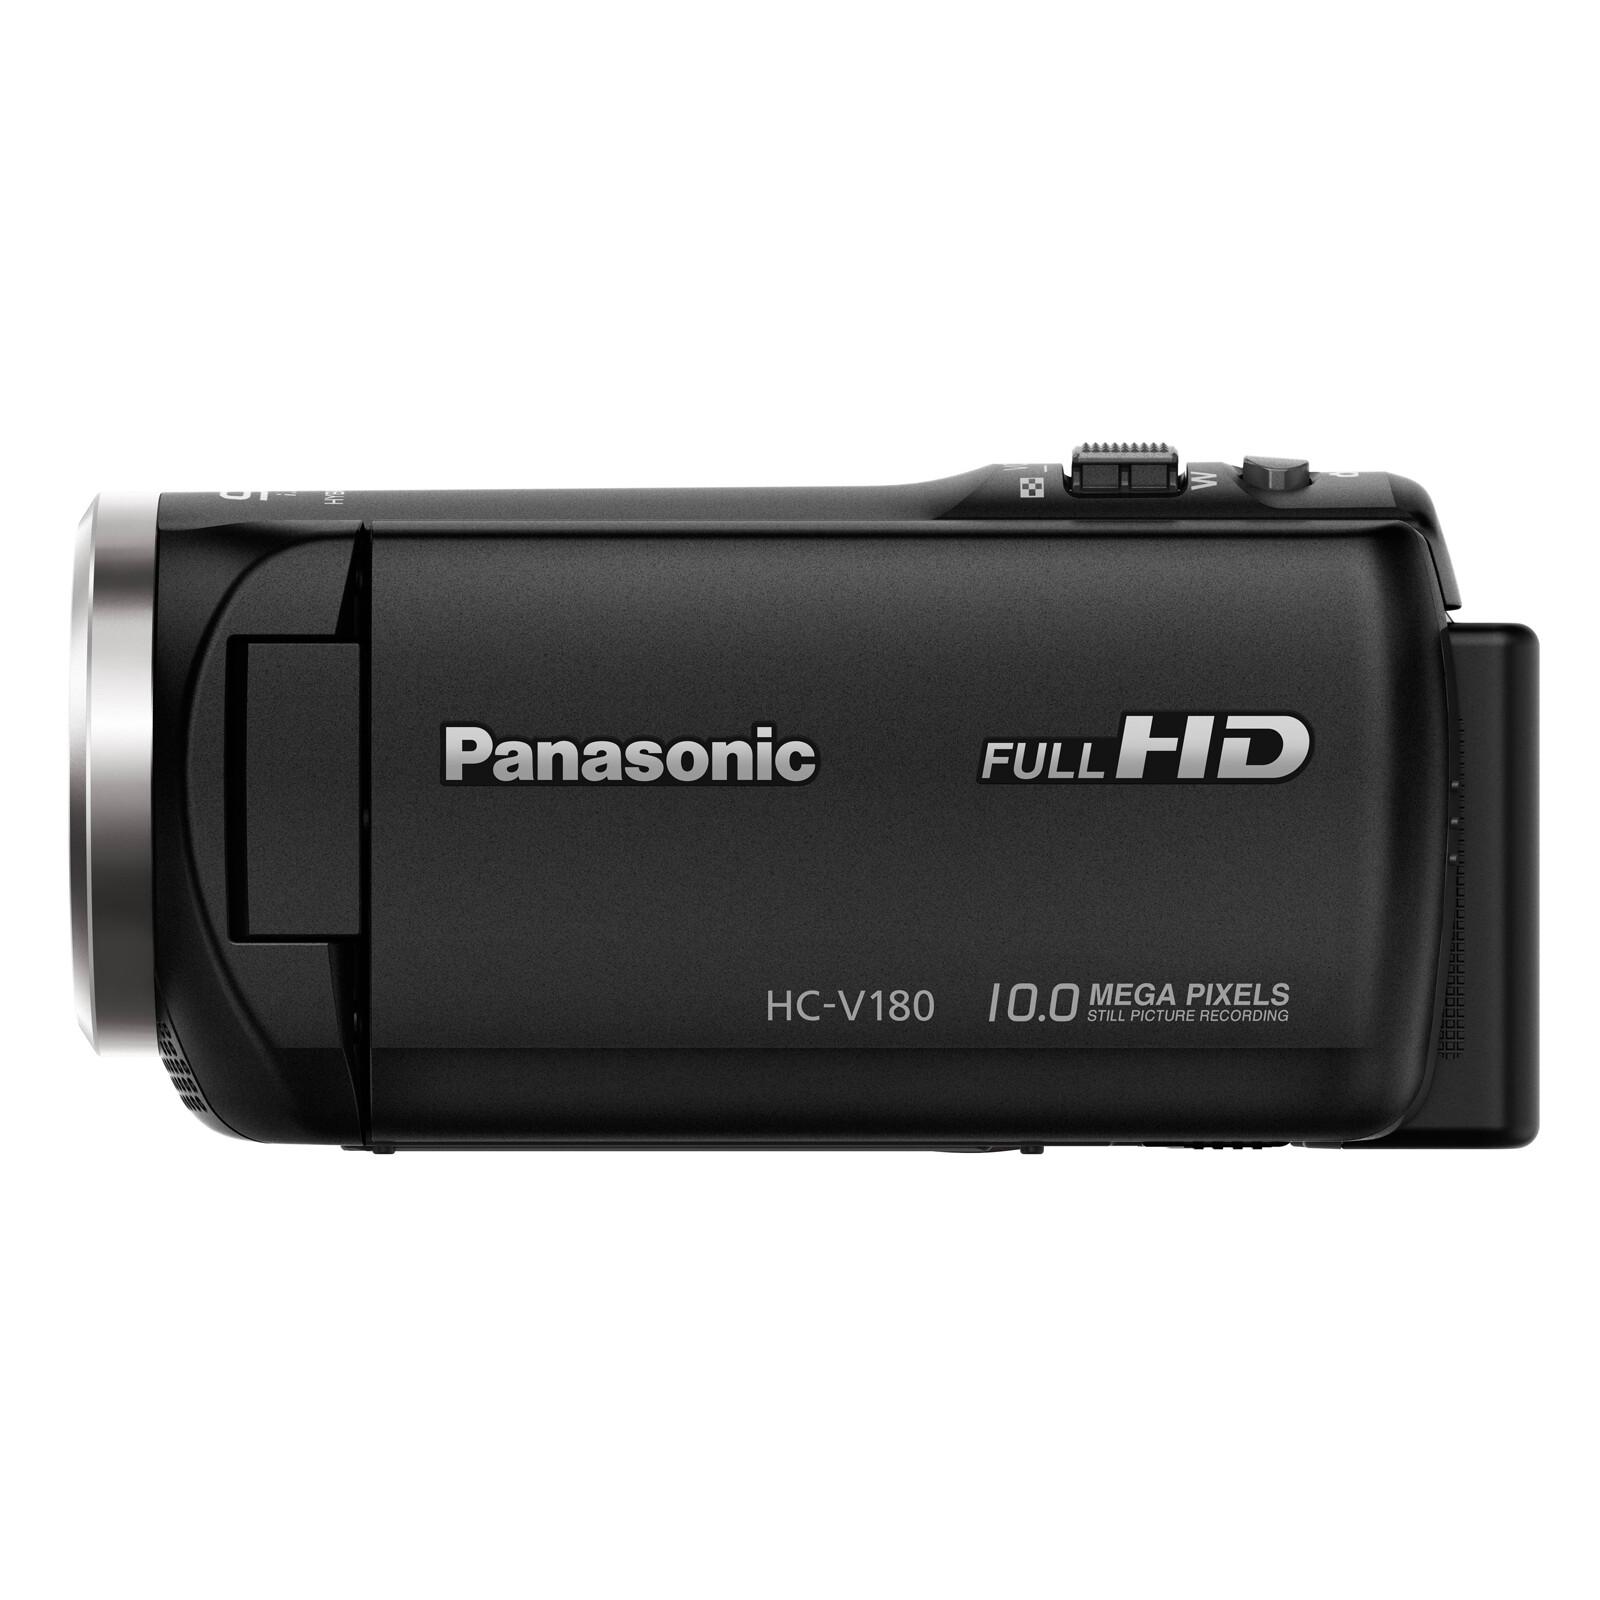 Panasonic HC-V180 Full HD Camcorder